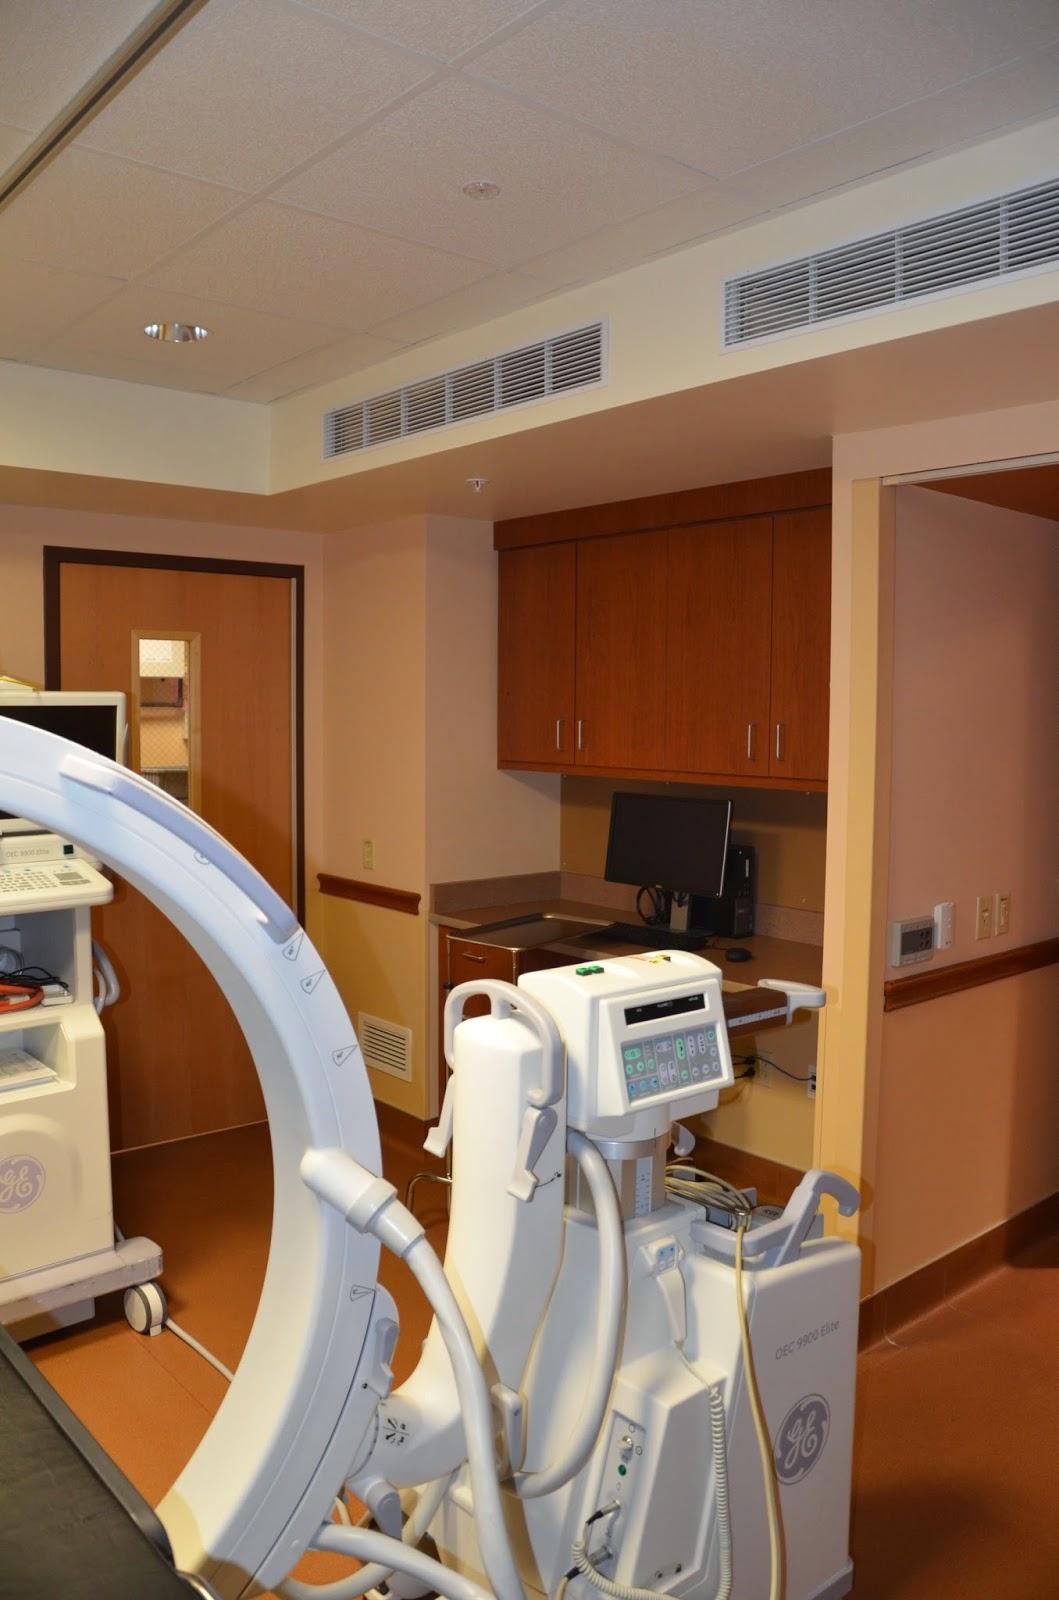 Hospital Procedure Room: P.J. Hoerr, Inc.: Graham Hospital